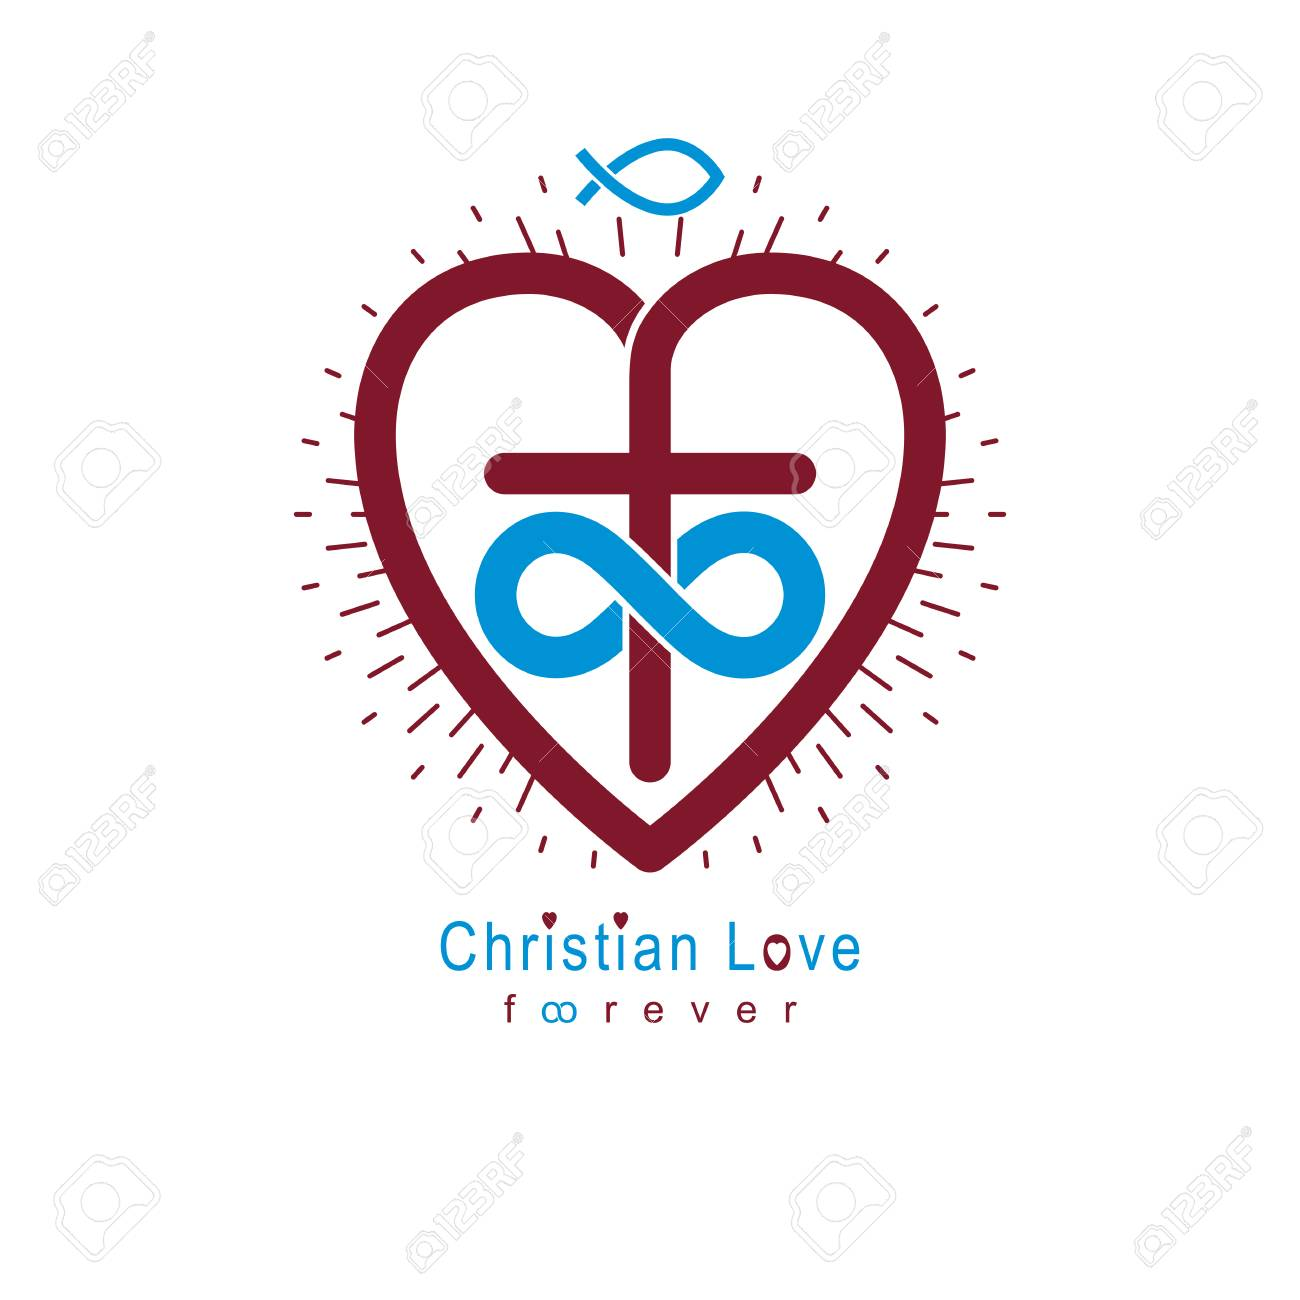 True Infinite Christian Love And Belief In God Vector Creative